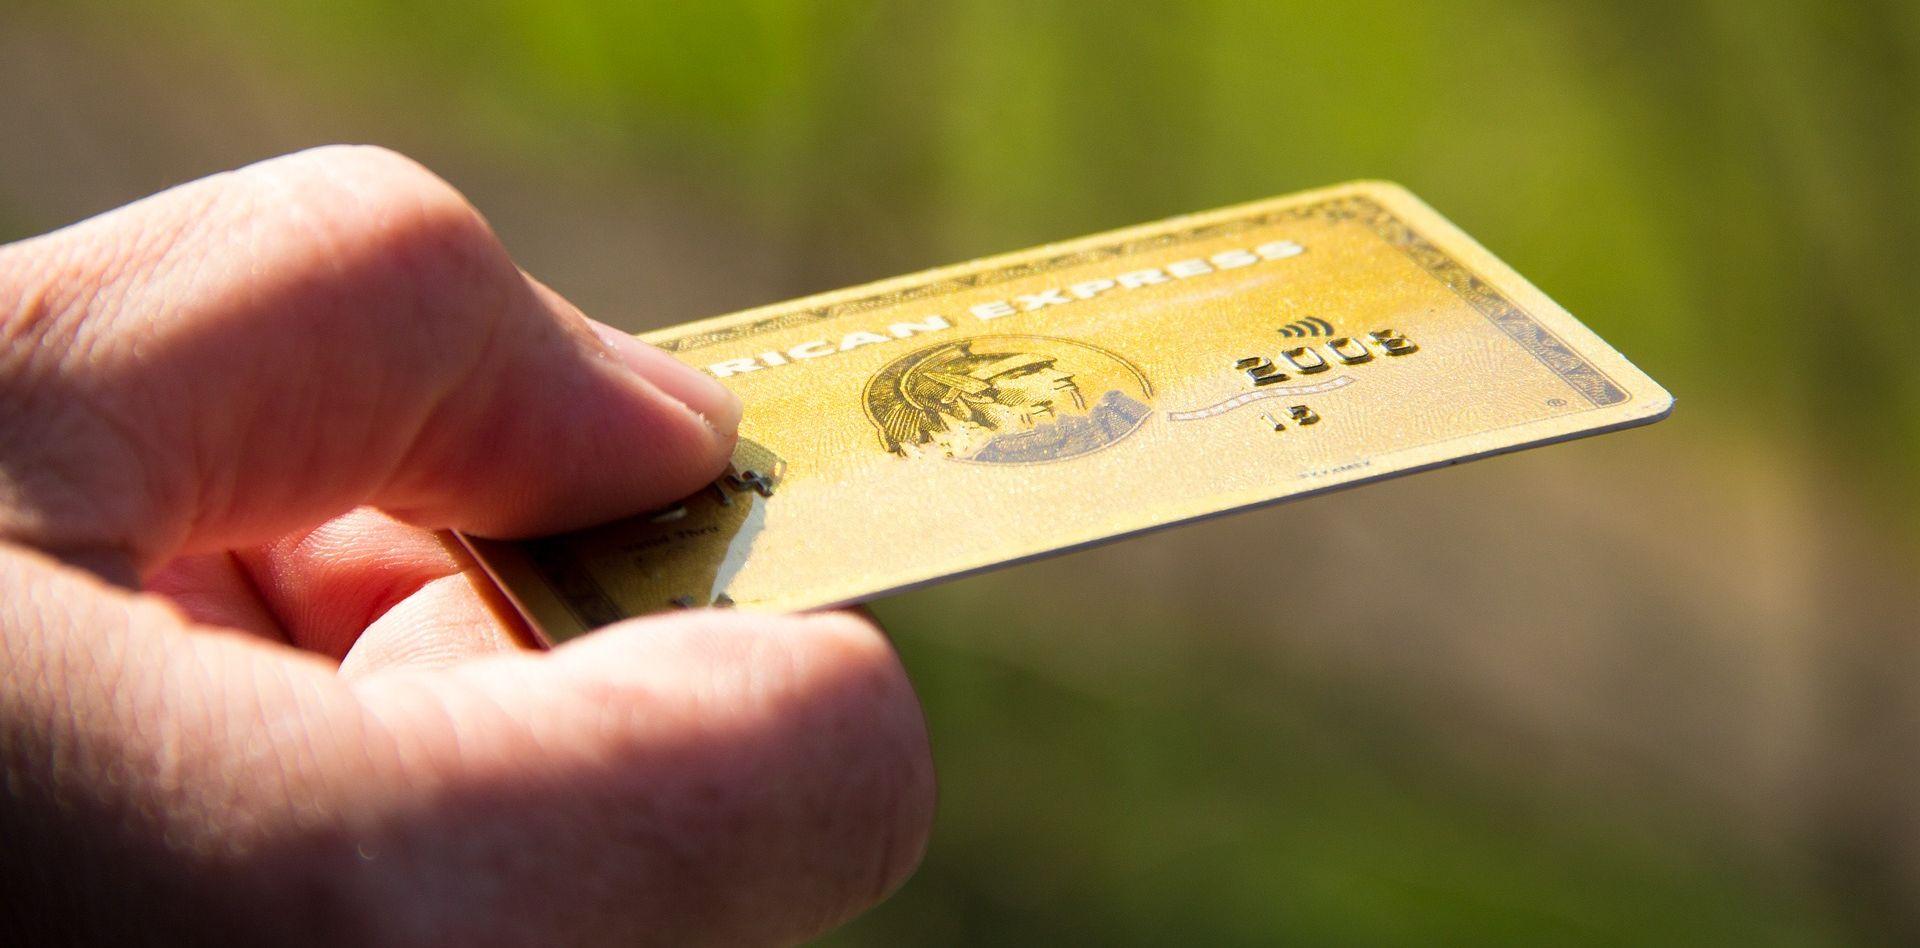 Korištenje American Express kartica do kraja 2019.